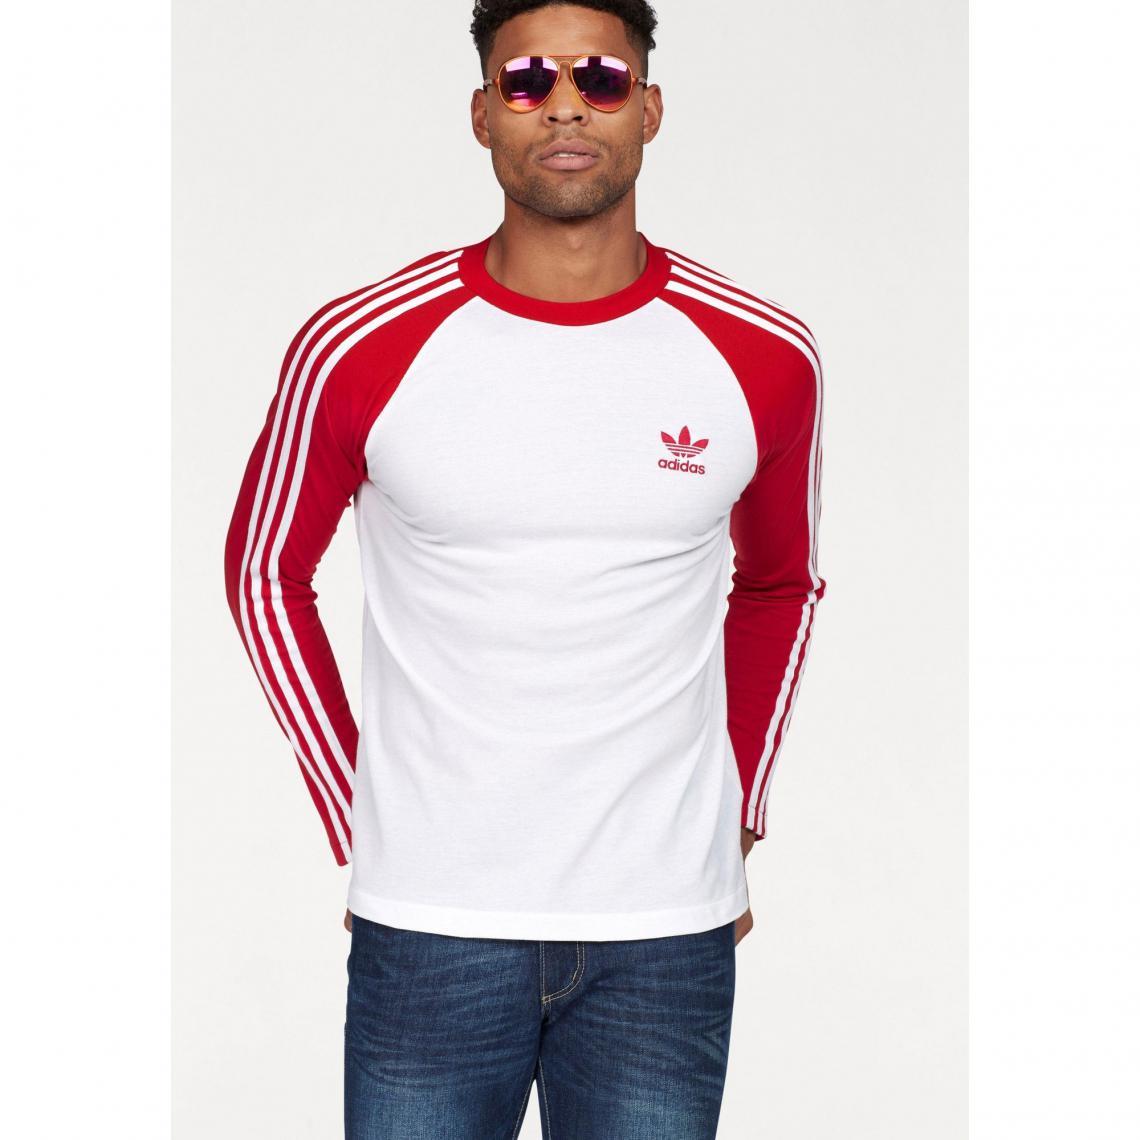 T-shirt manches courtes camouflage homme adidas Originals® - Blanc - Rouge  Adidas Originals 4174d332a358